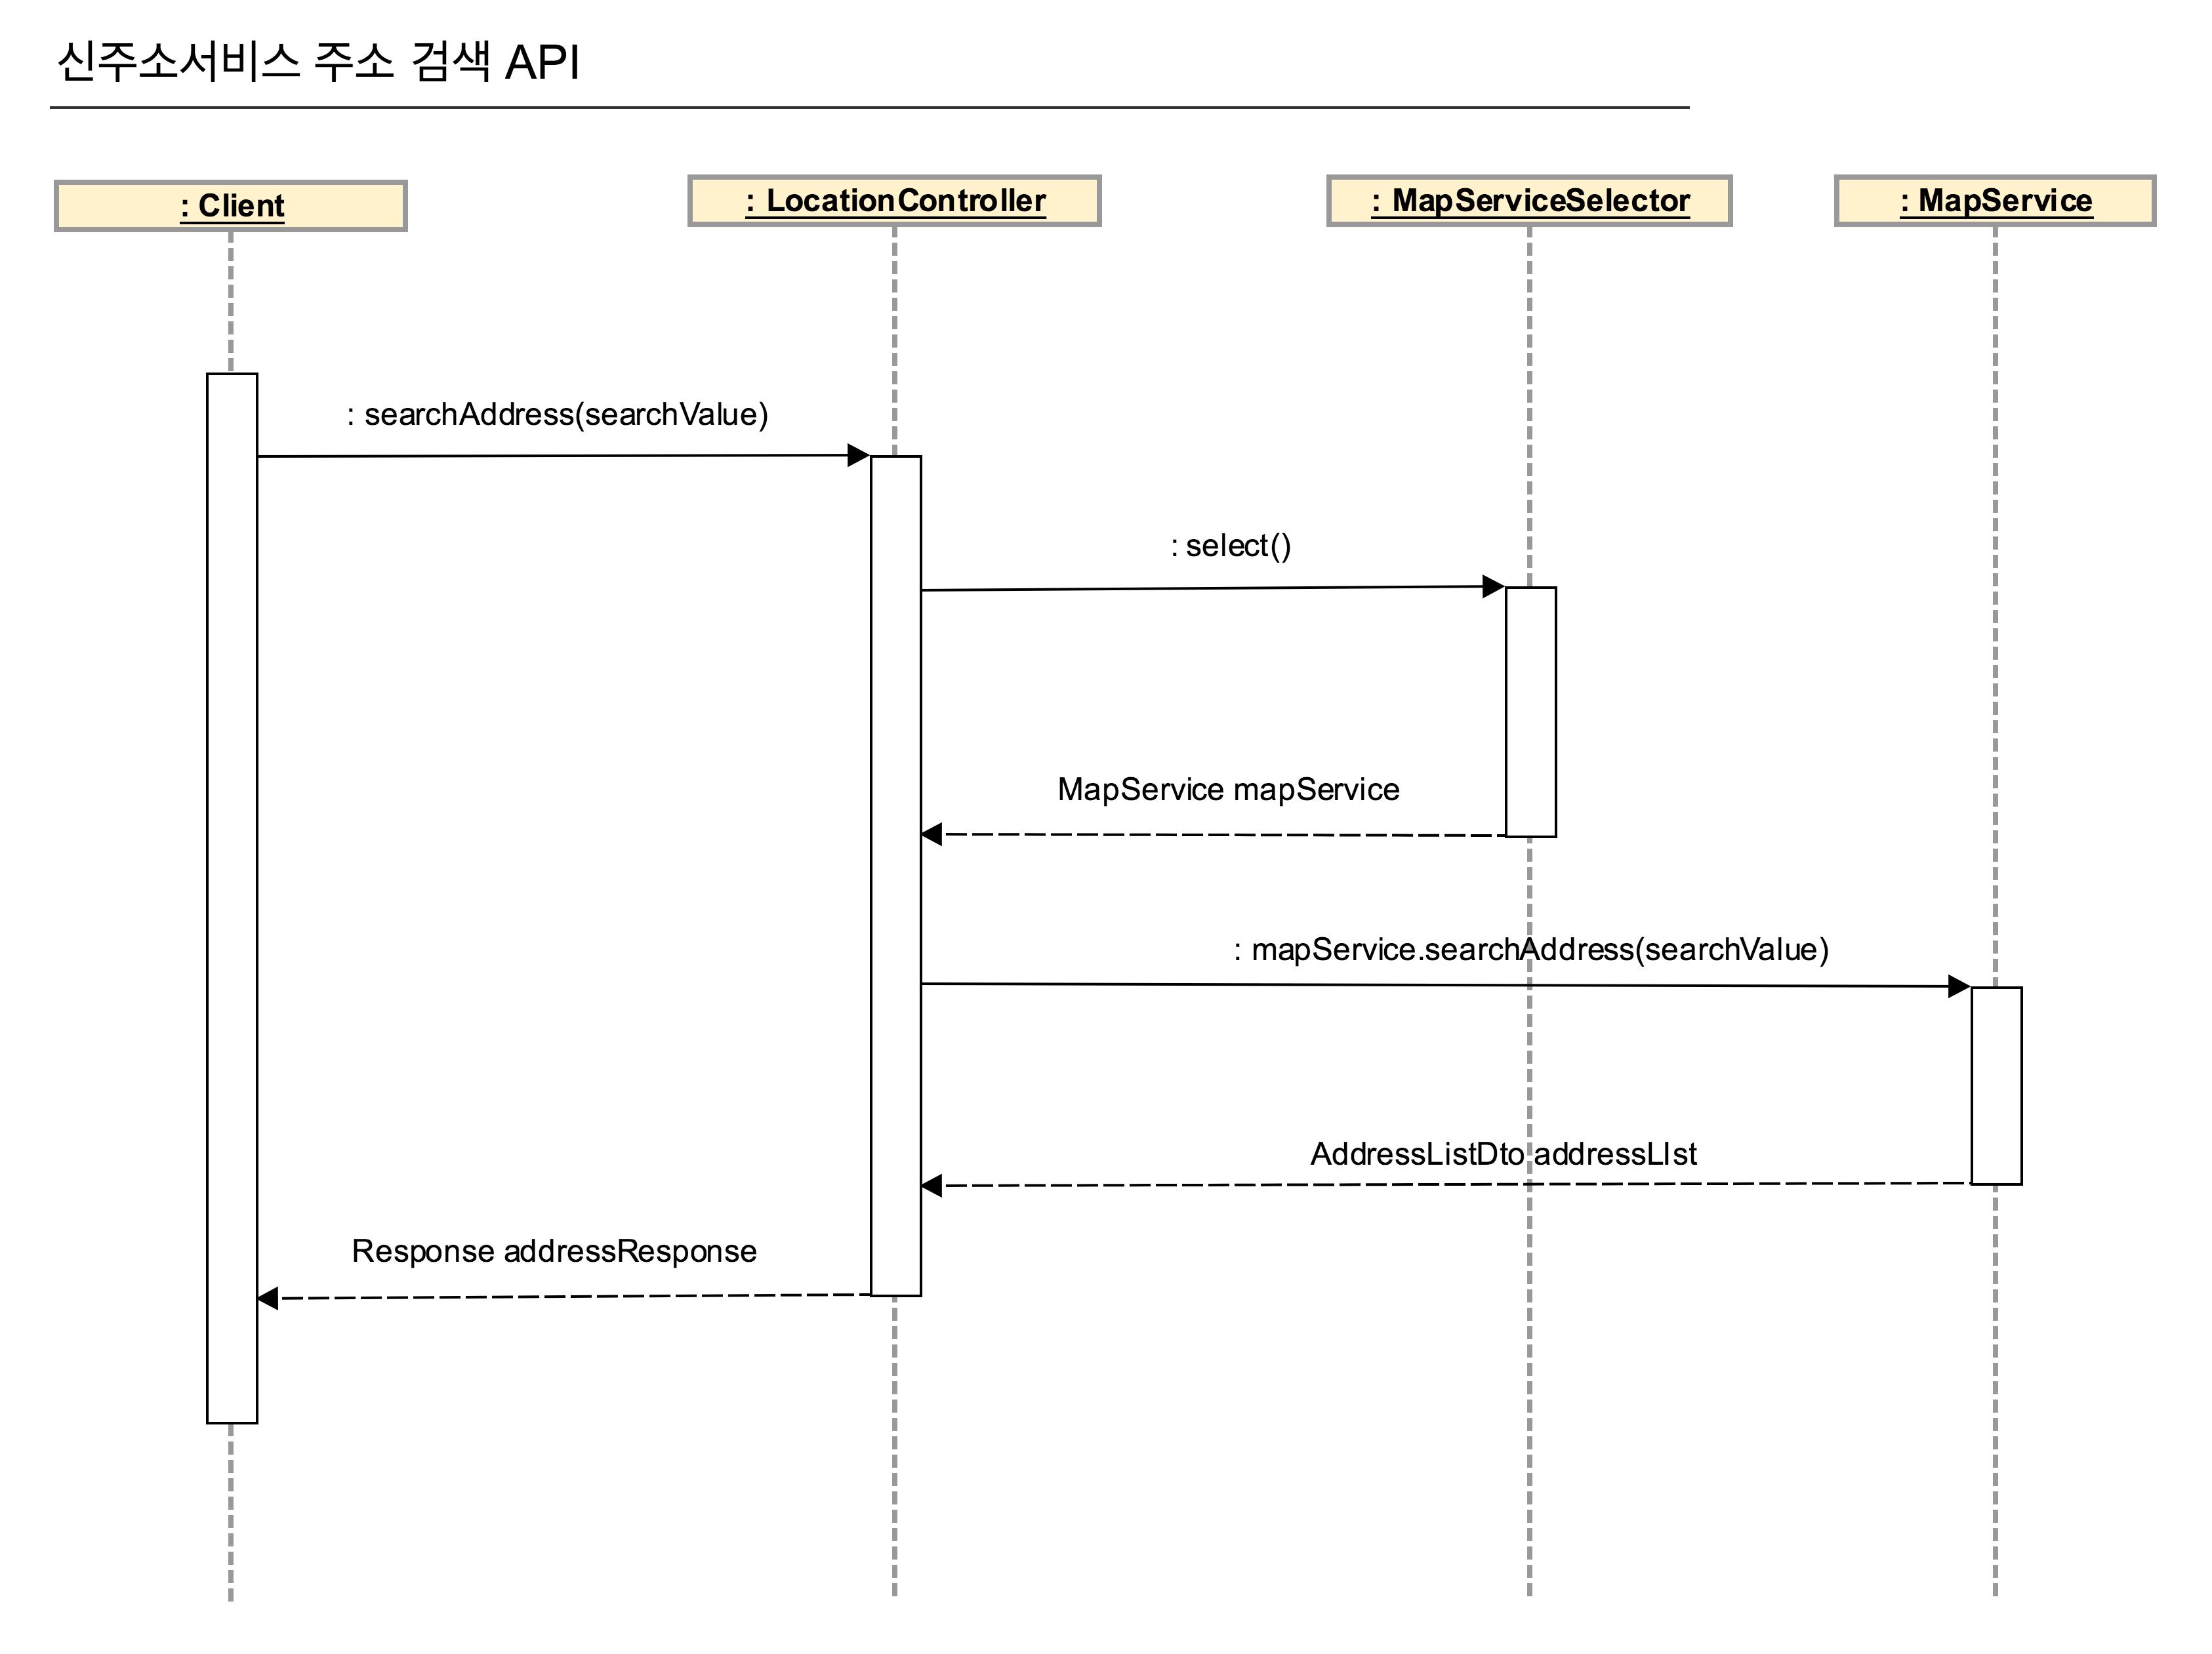 new-location-api-flow-diagram